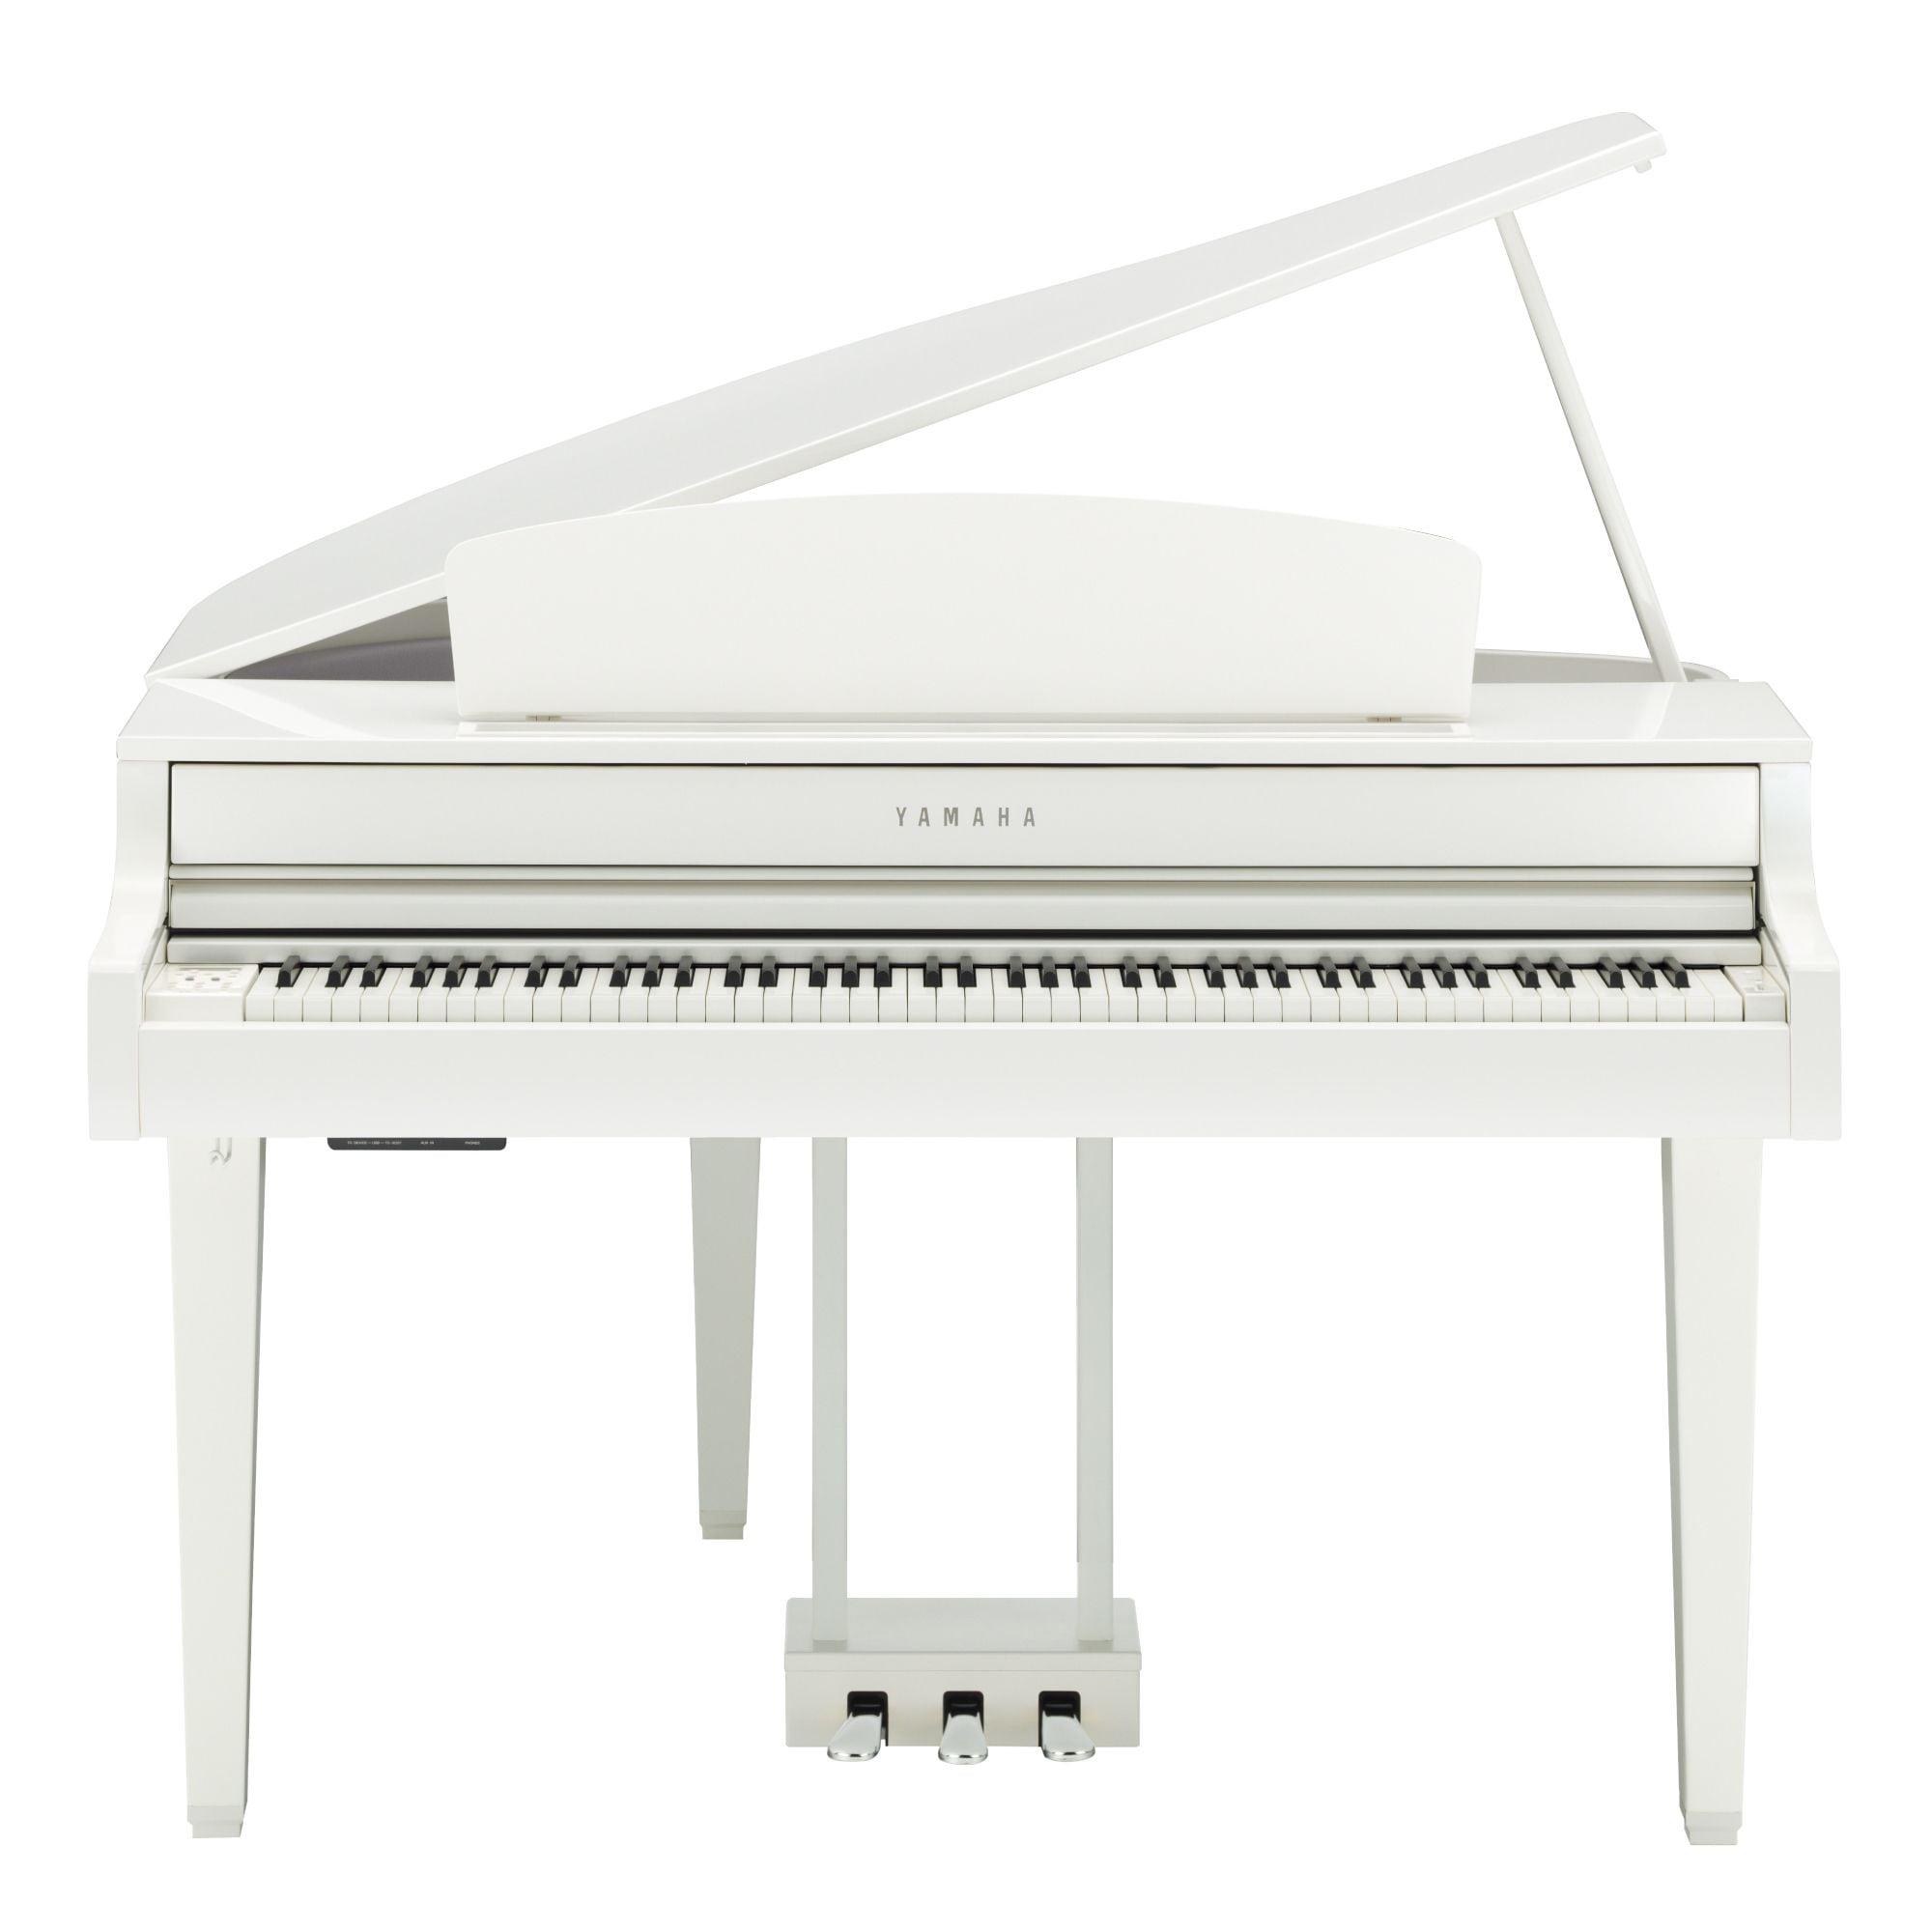 USB cable for Yamaha DIGITAL PIANO CLP-565GP